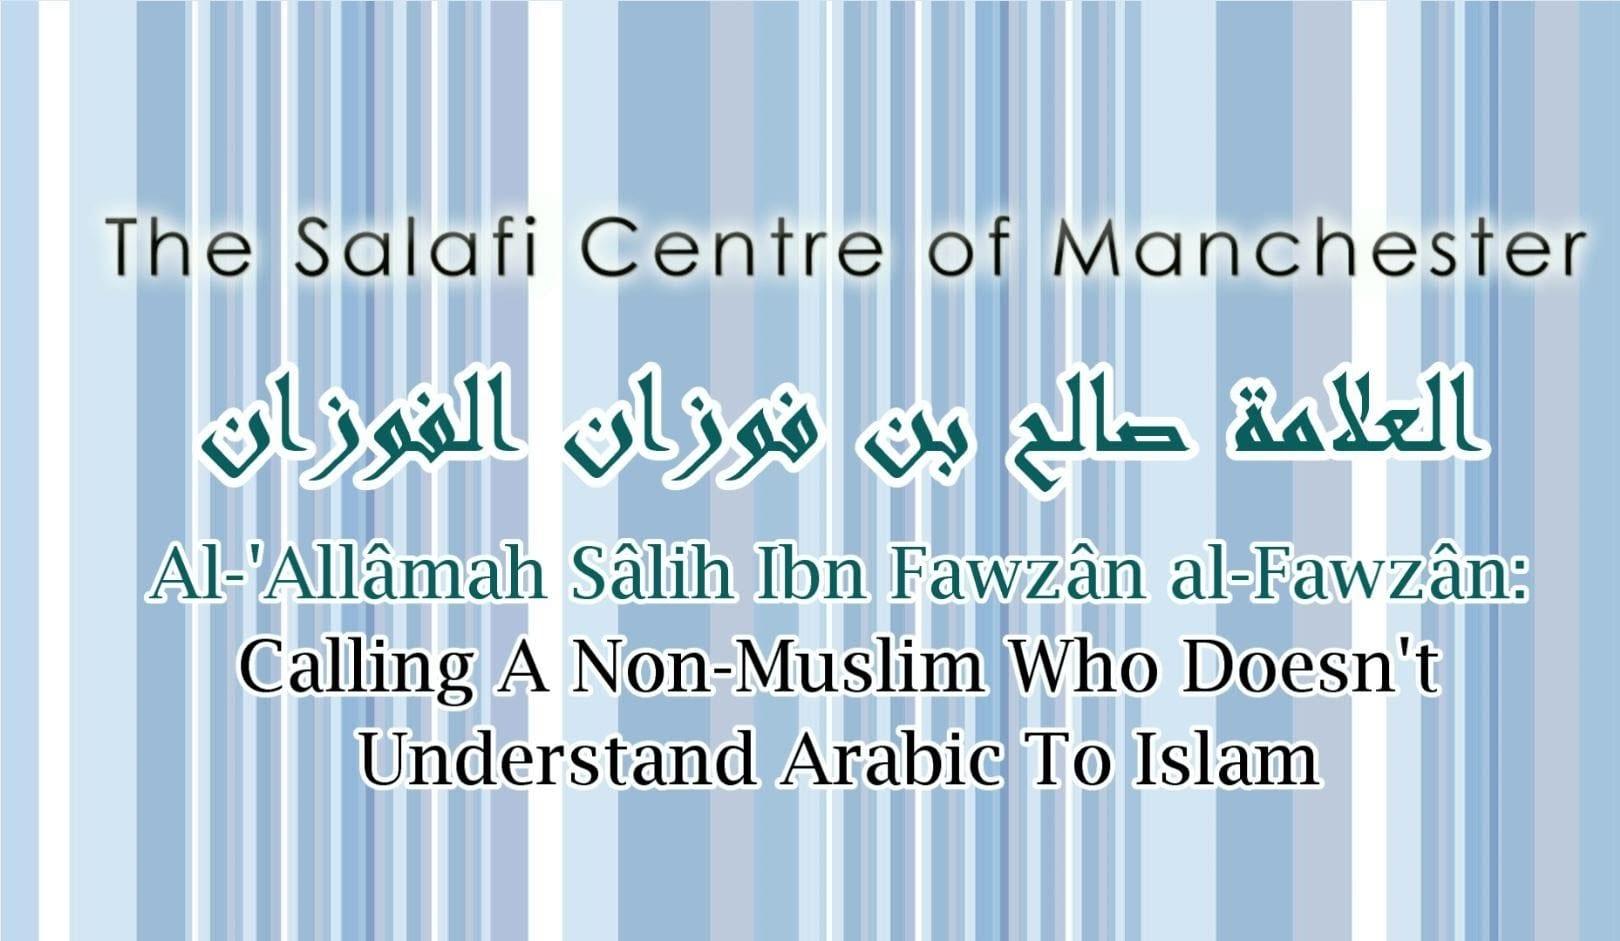 Calling A Non-Muslim To Islam Who Doesn't Know Arabic | Al-'Allâmah Sâlih al-Fawzân